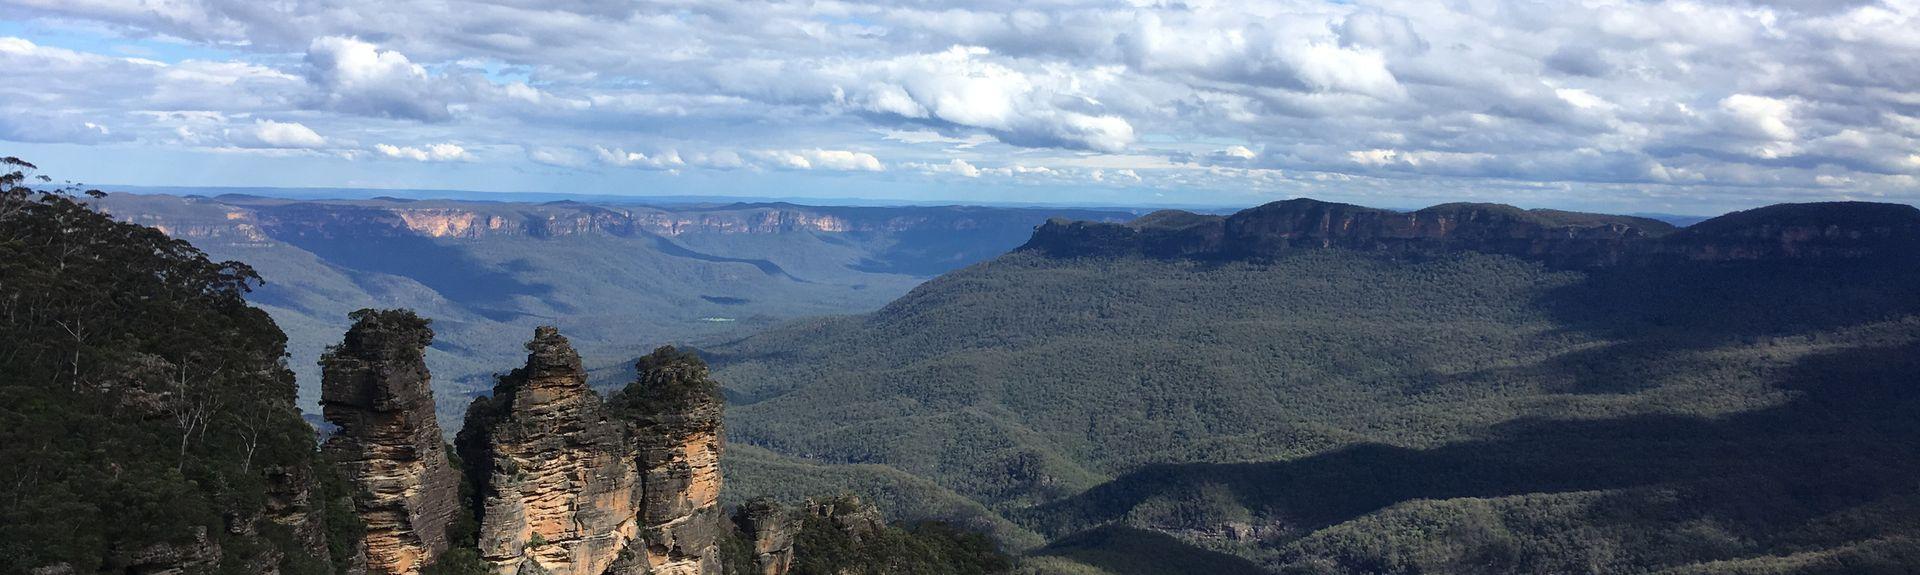 Kanimbla, New South Wales, Australia